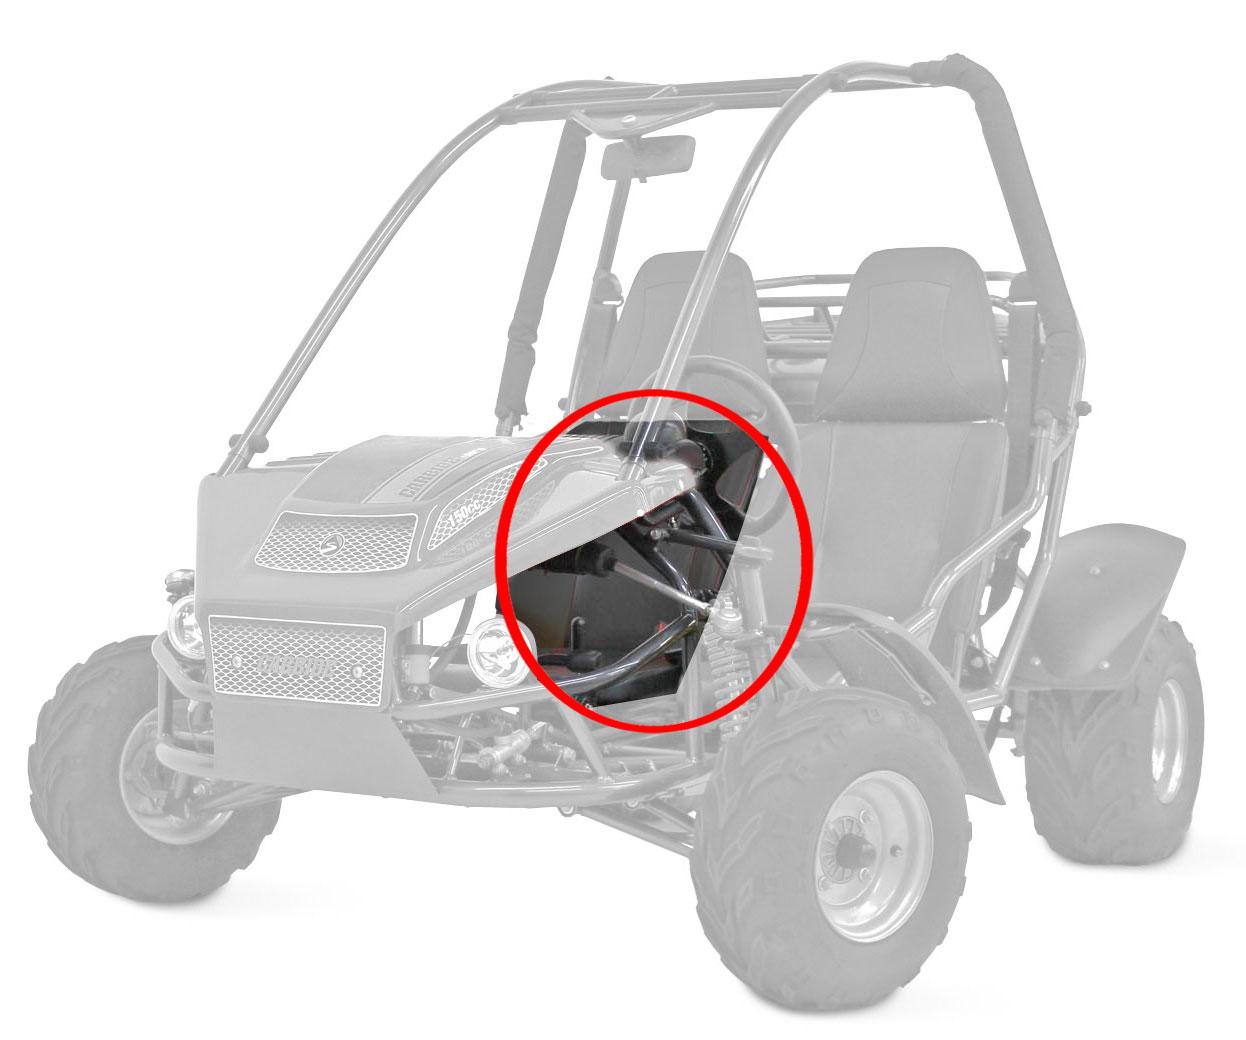 Passenger Seat for ASW Carbide 150cc Go Kart | C14169 | American ...